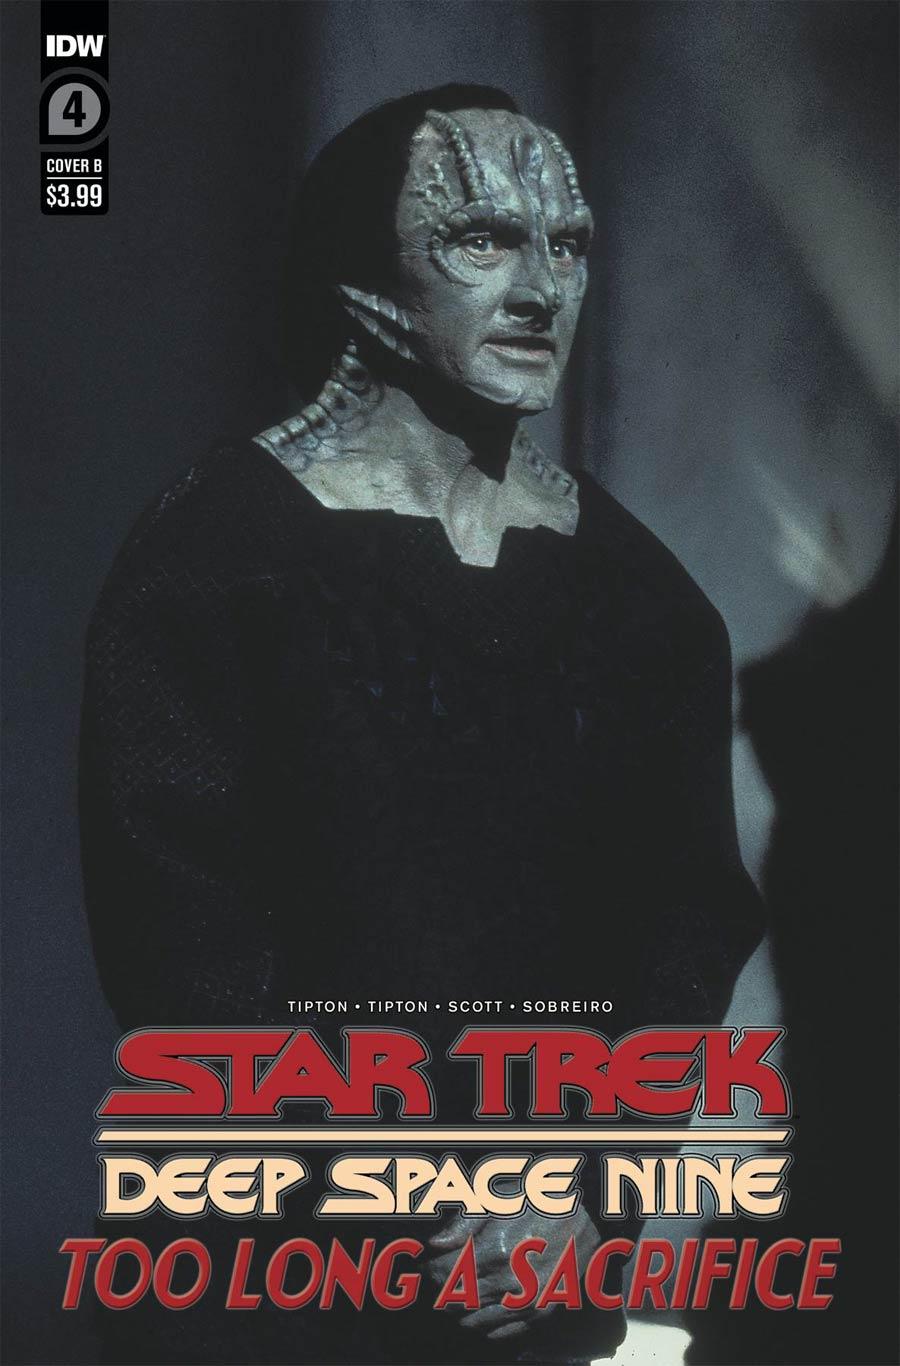 Star Trek Deep Space Nine Too Long A Sacrifice #4 Cover B Variant Photo Cover